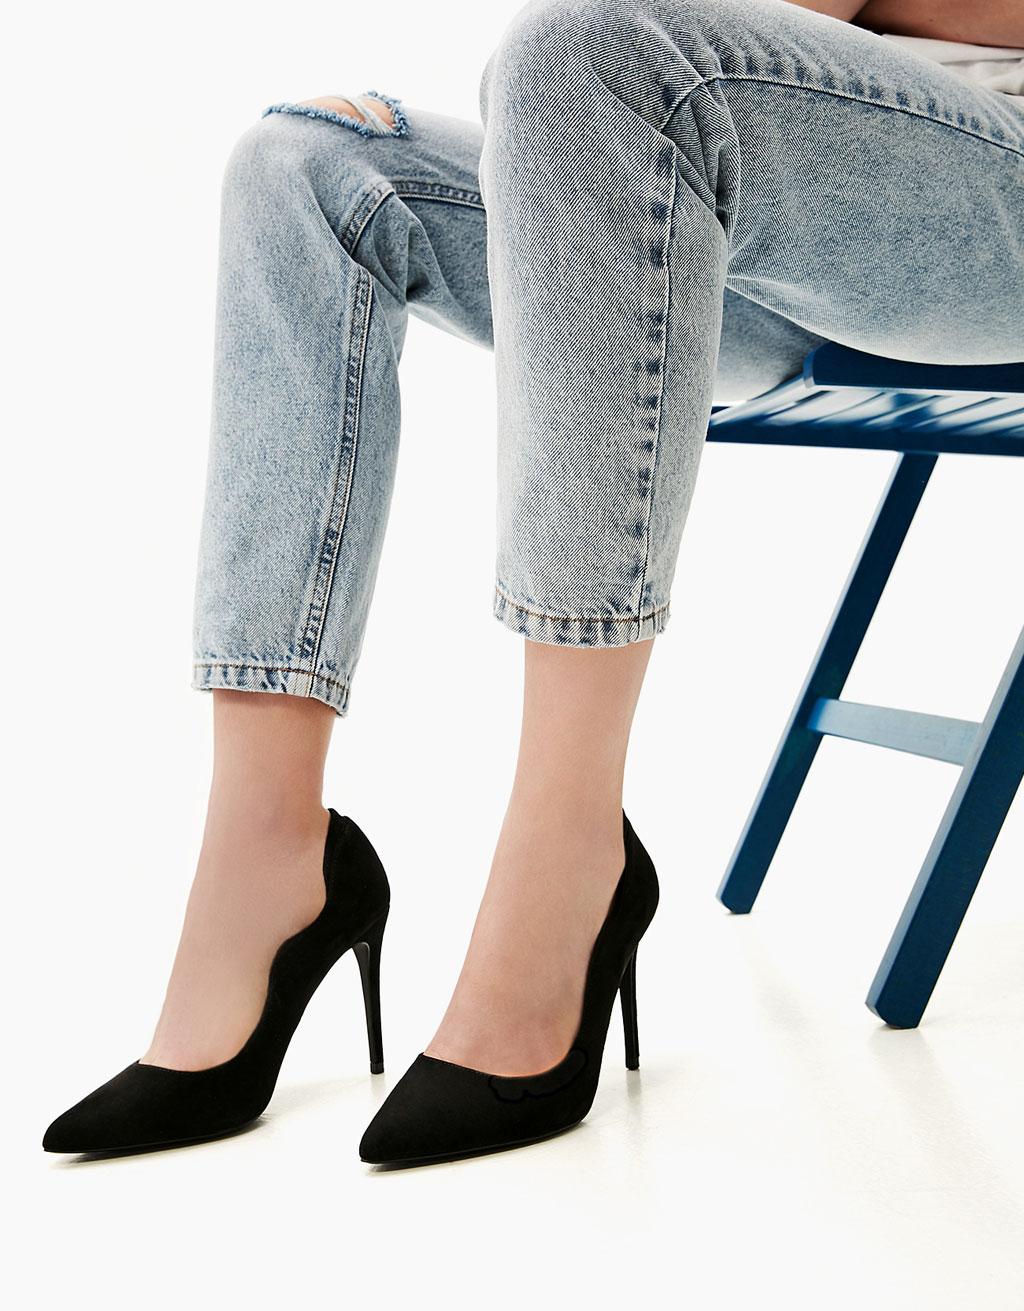 Scalloped stiletto heel shoes